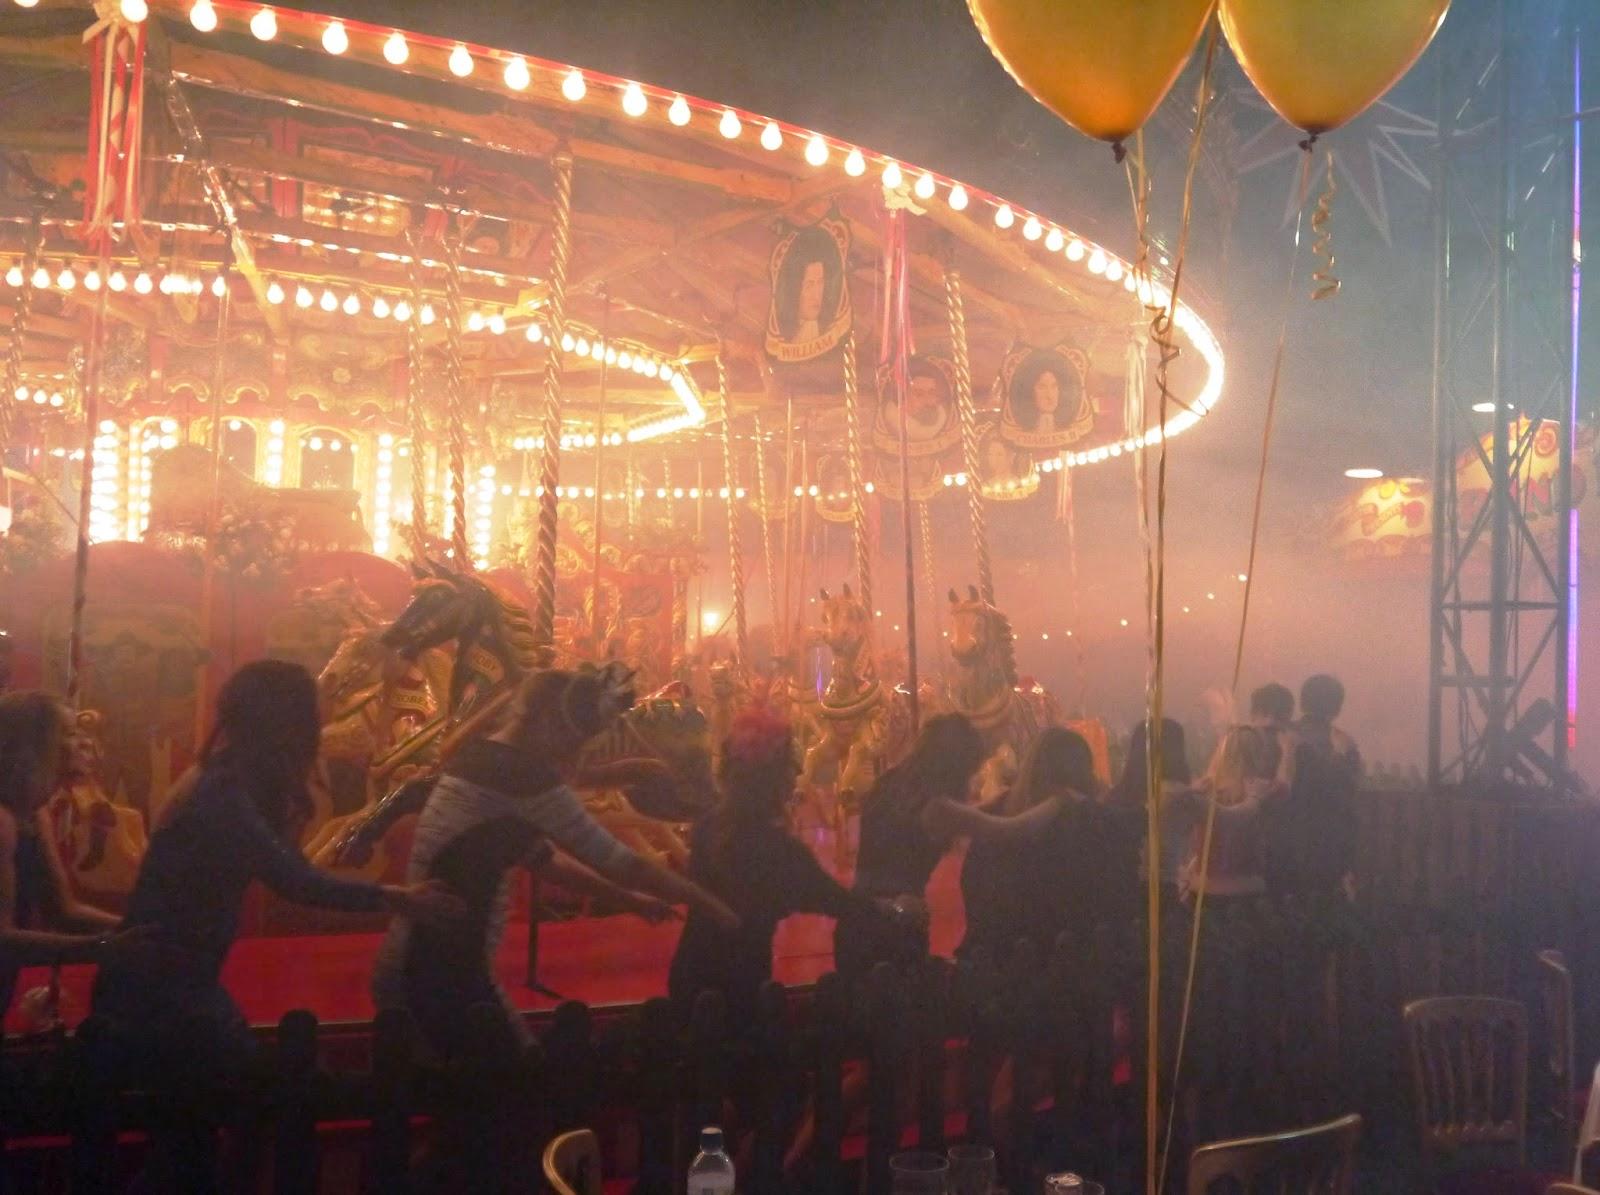 Carters Steam Fair Wedding - conga line around the gallopers